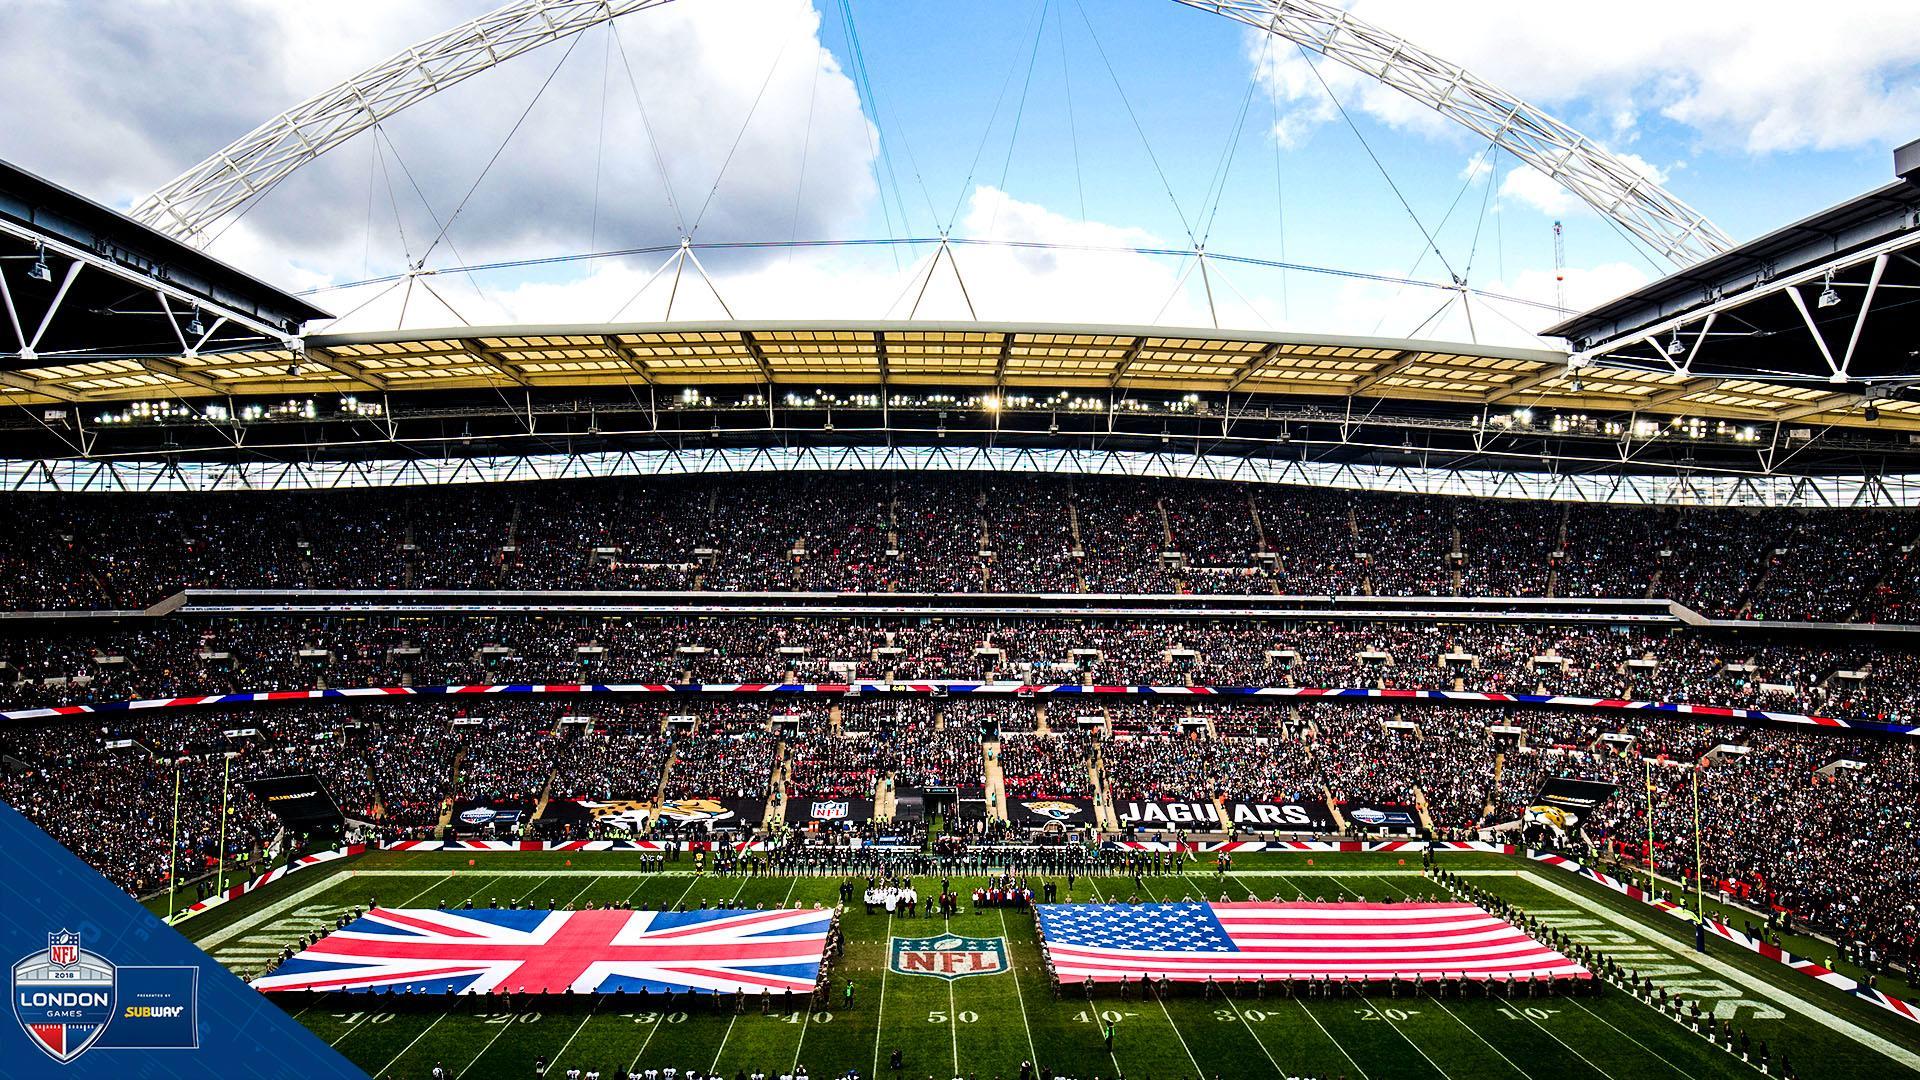 Qualche considerazione sulle International Series londinesi